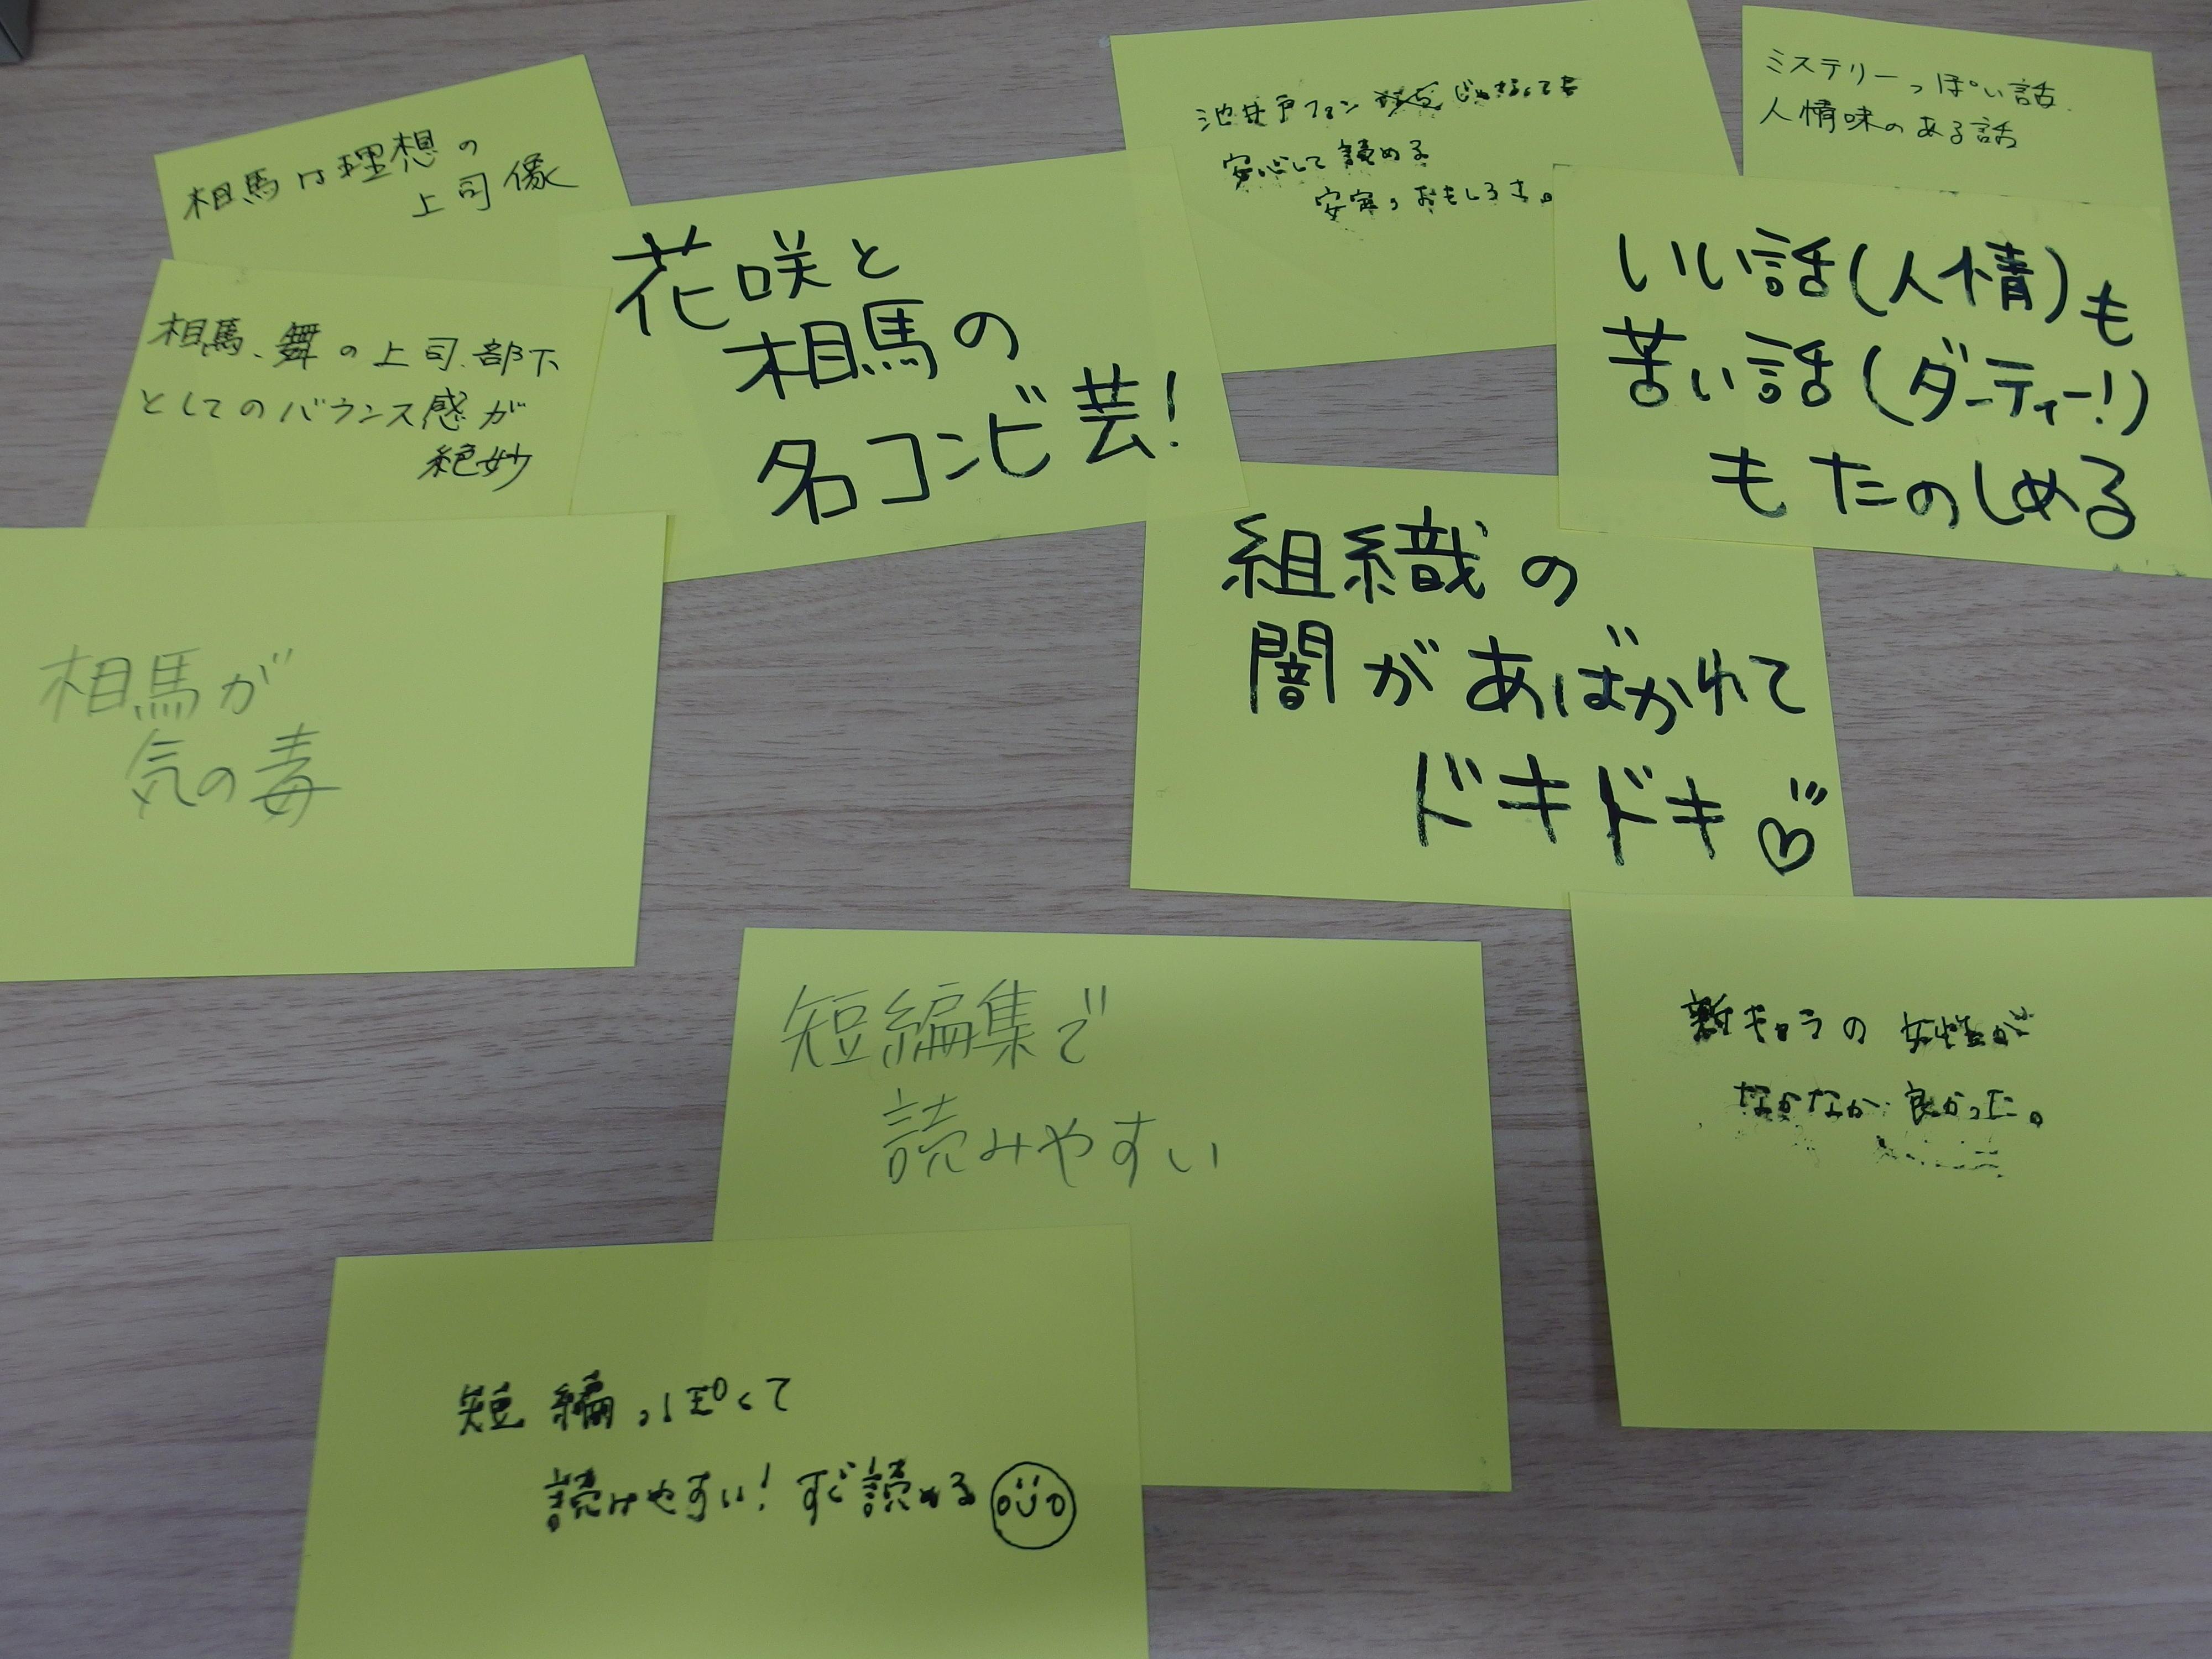 photo_01_01.JPG